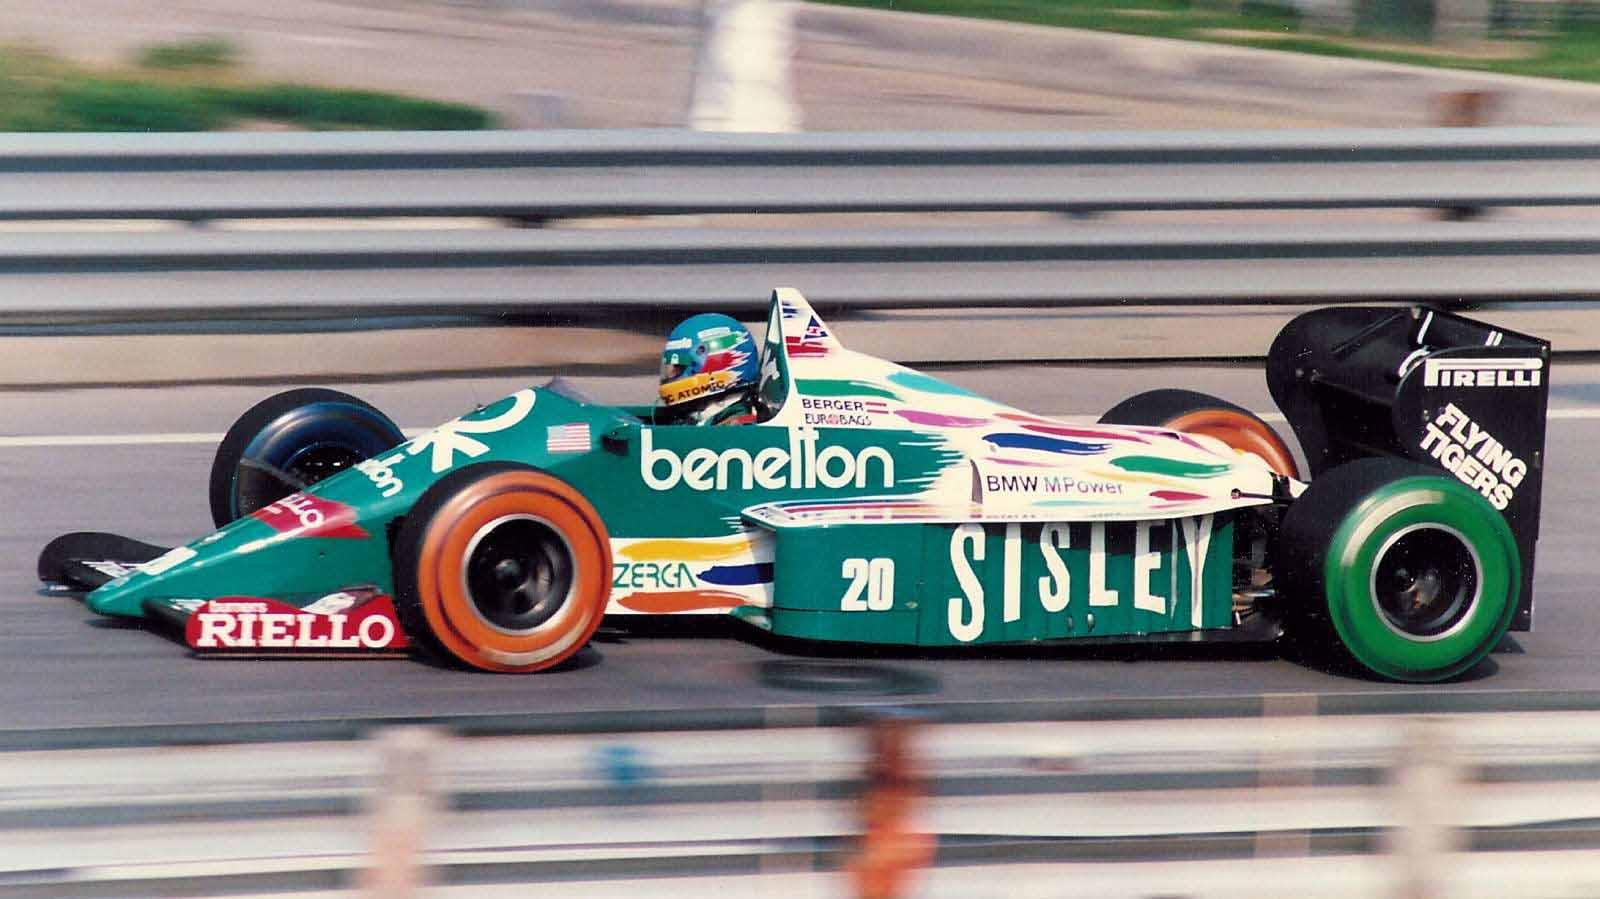 Gerhard_Berger_1986_Detroit.jpg